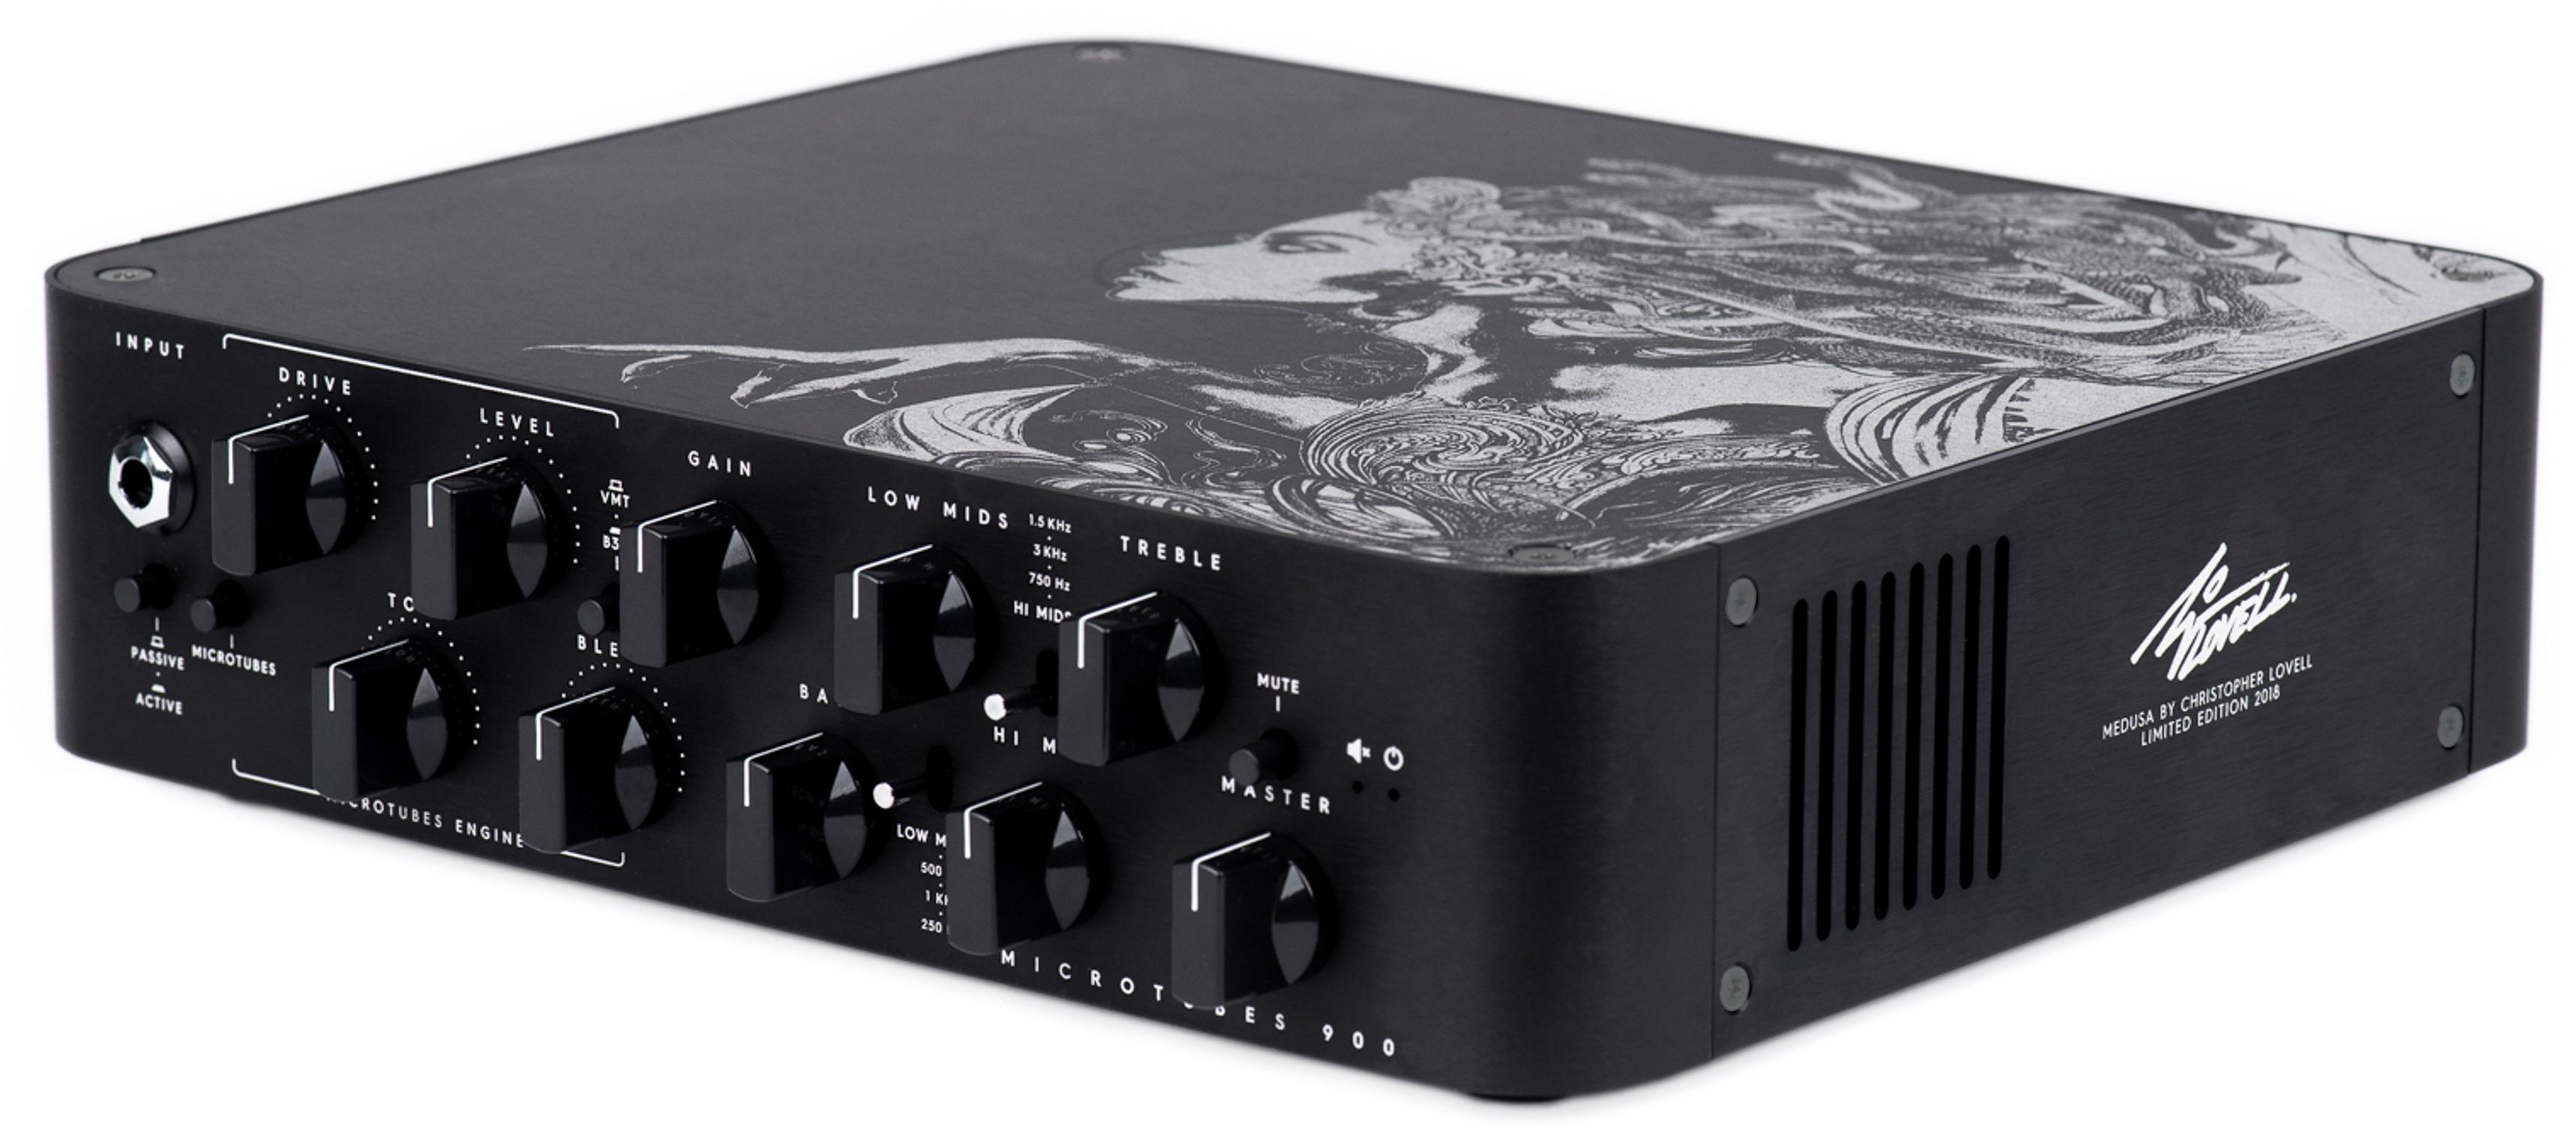 ebc8e16c5cb Darkglass Microtubes 900 Ltd Medusa Christopher Lovell Bass amp head ...